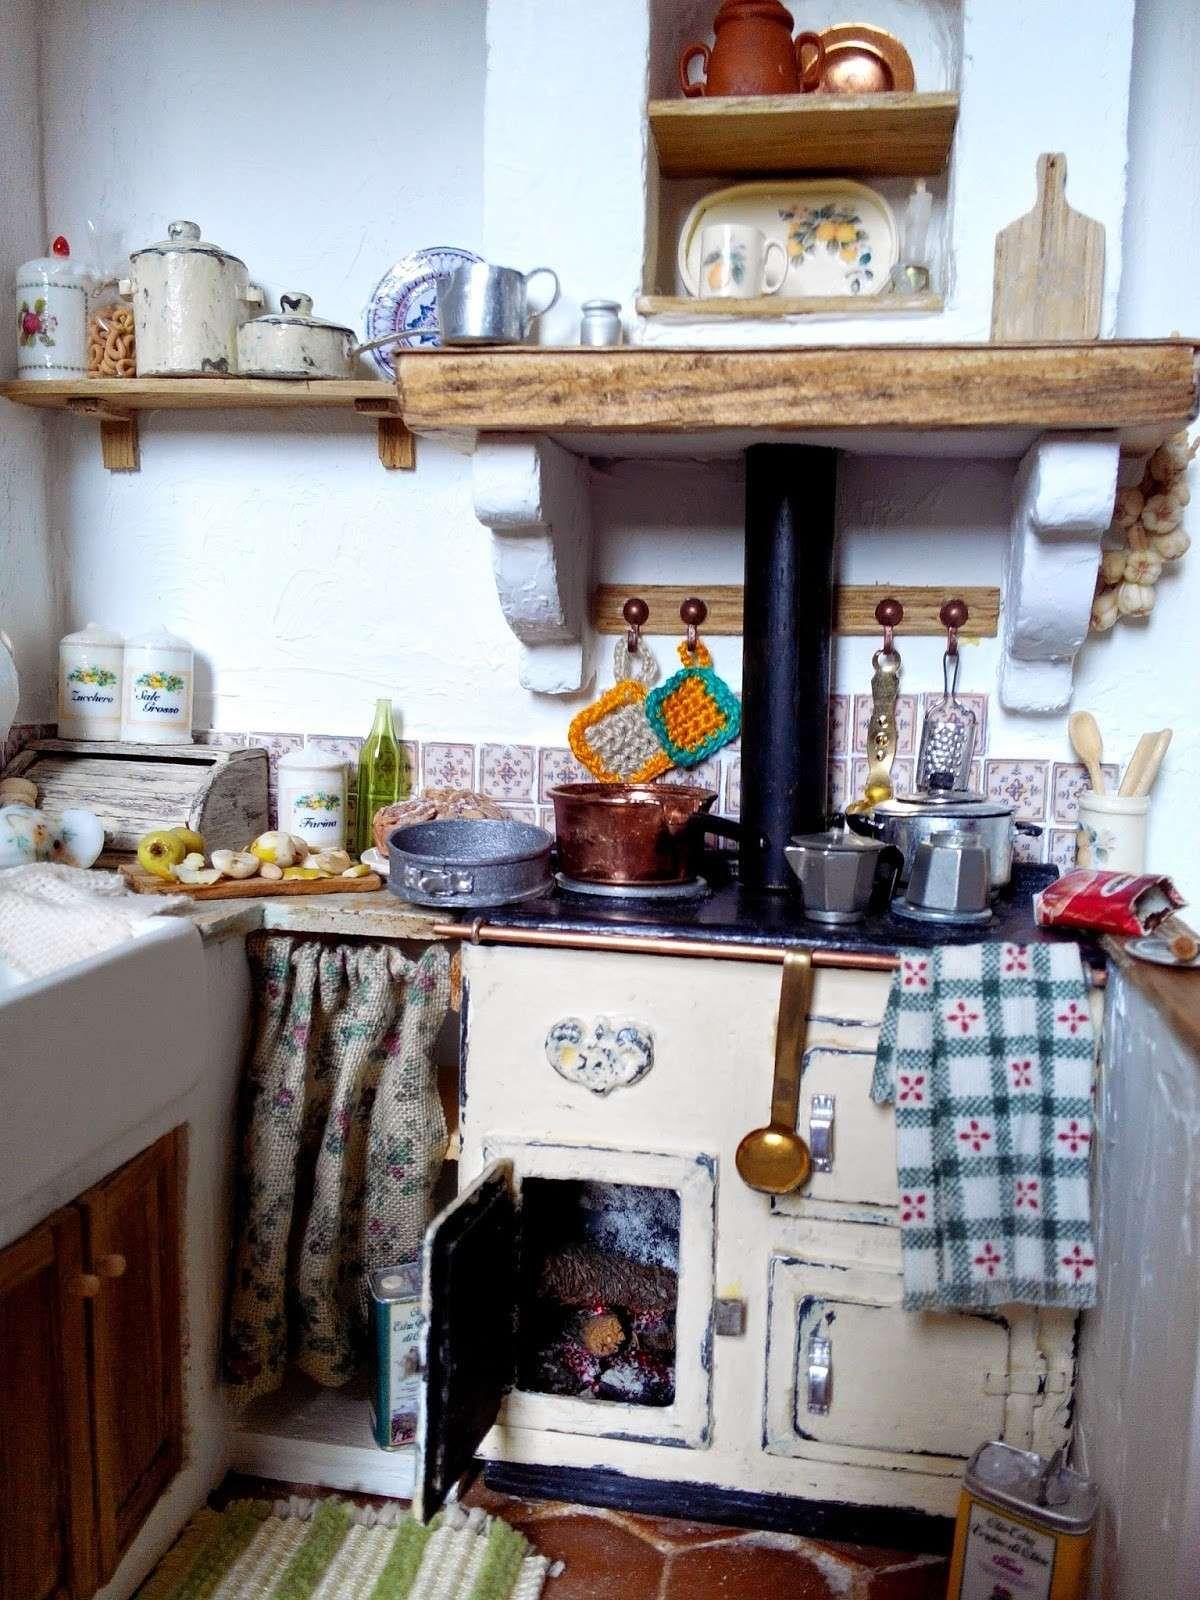 Risultati immagini per mensole cucina fai da te cucine for Immagini per cucina